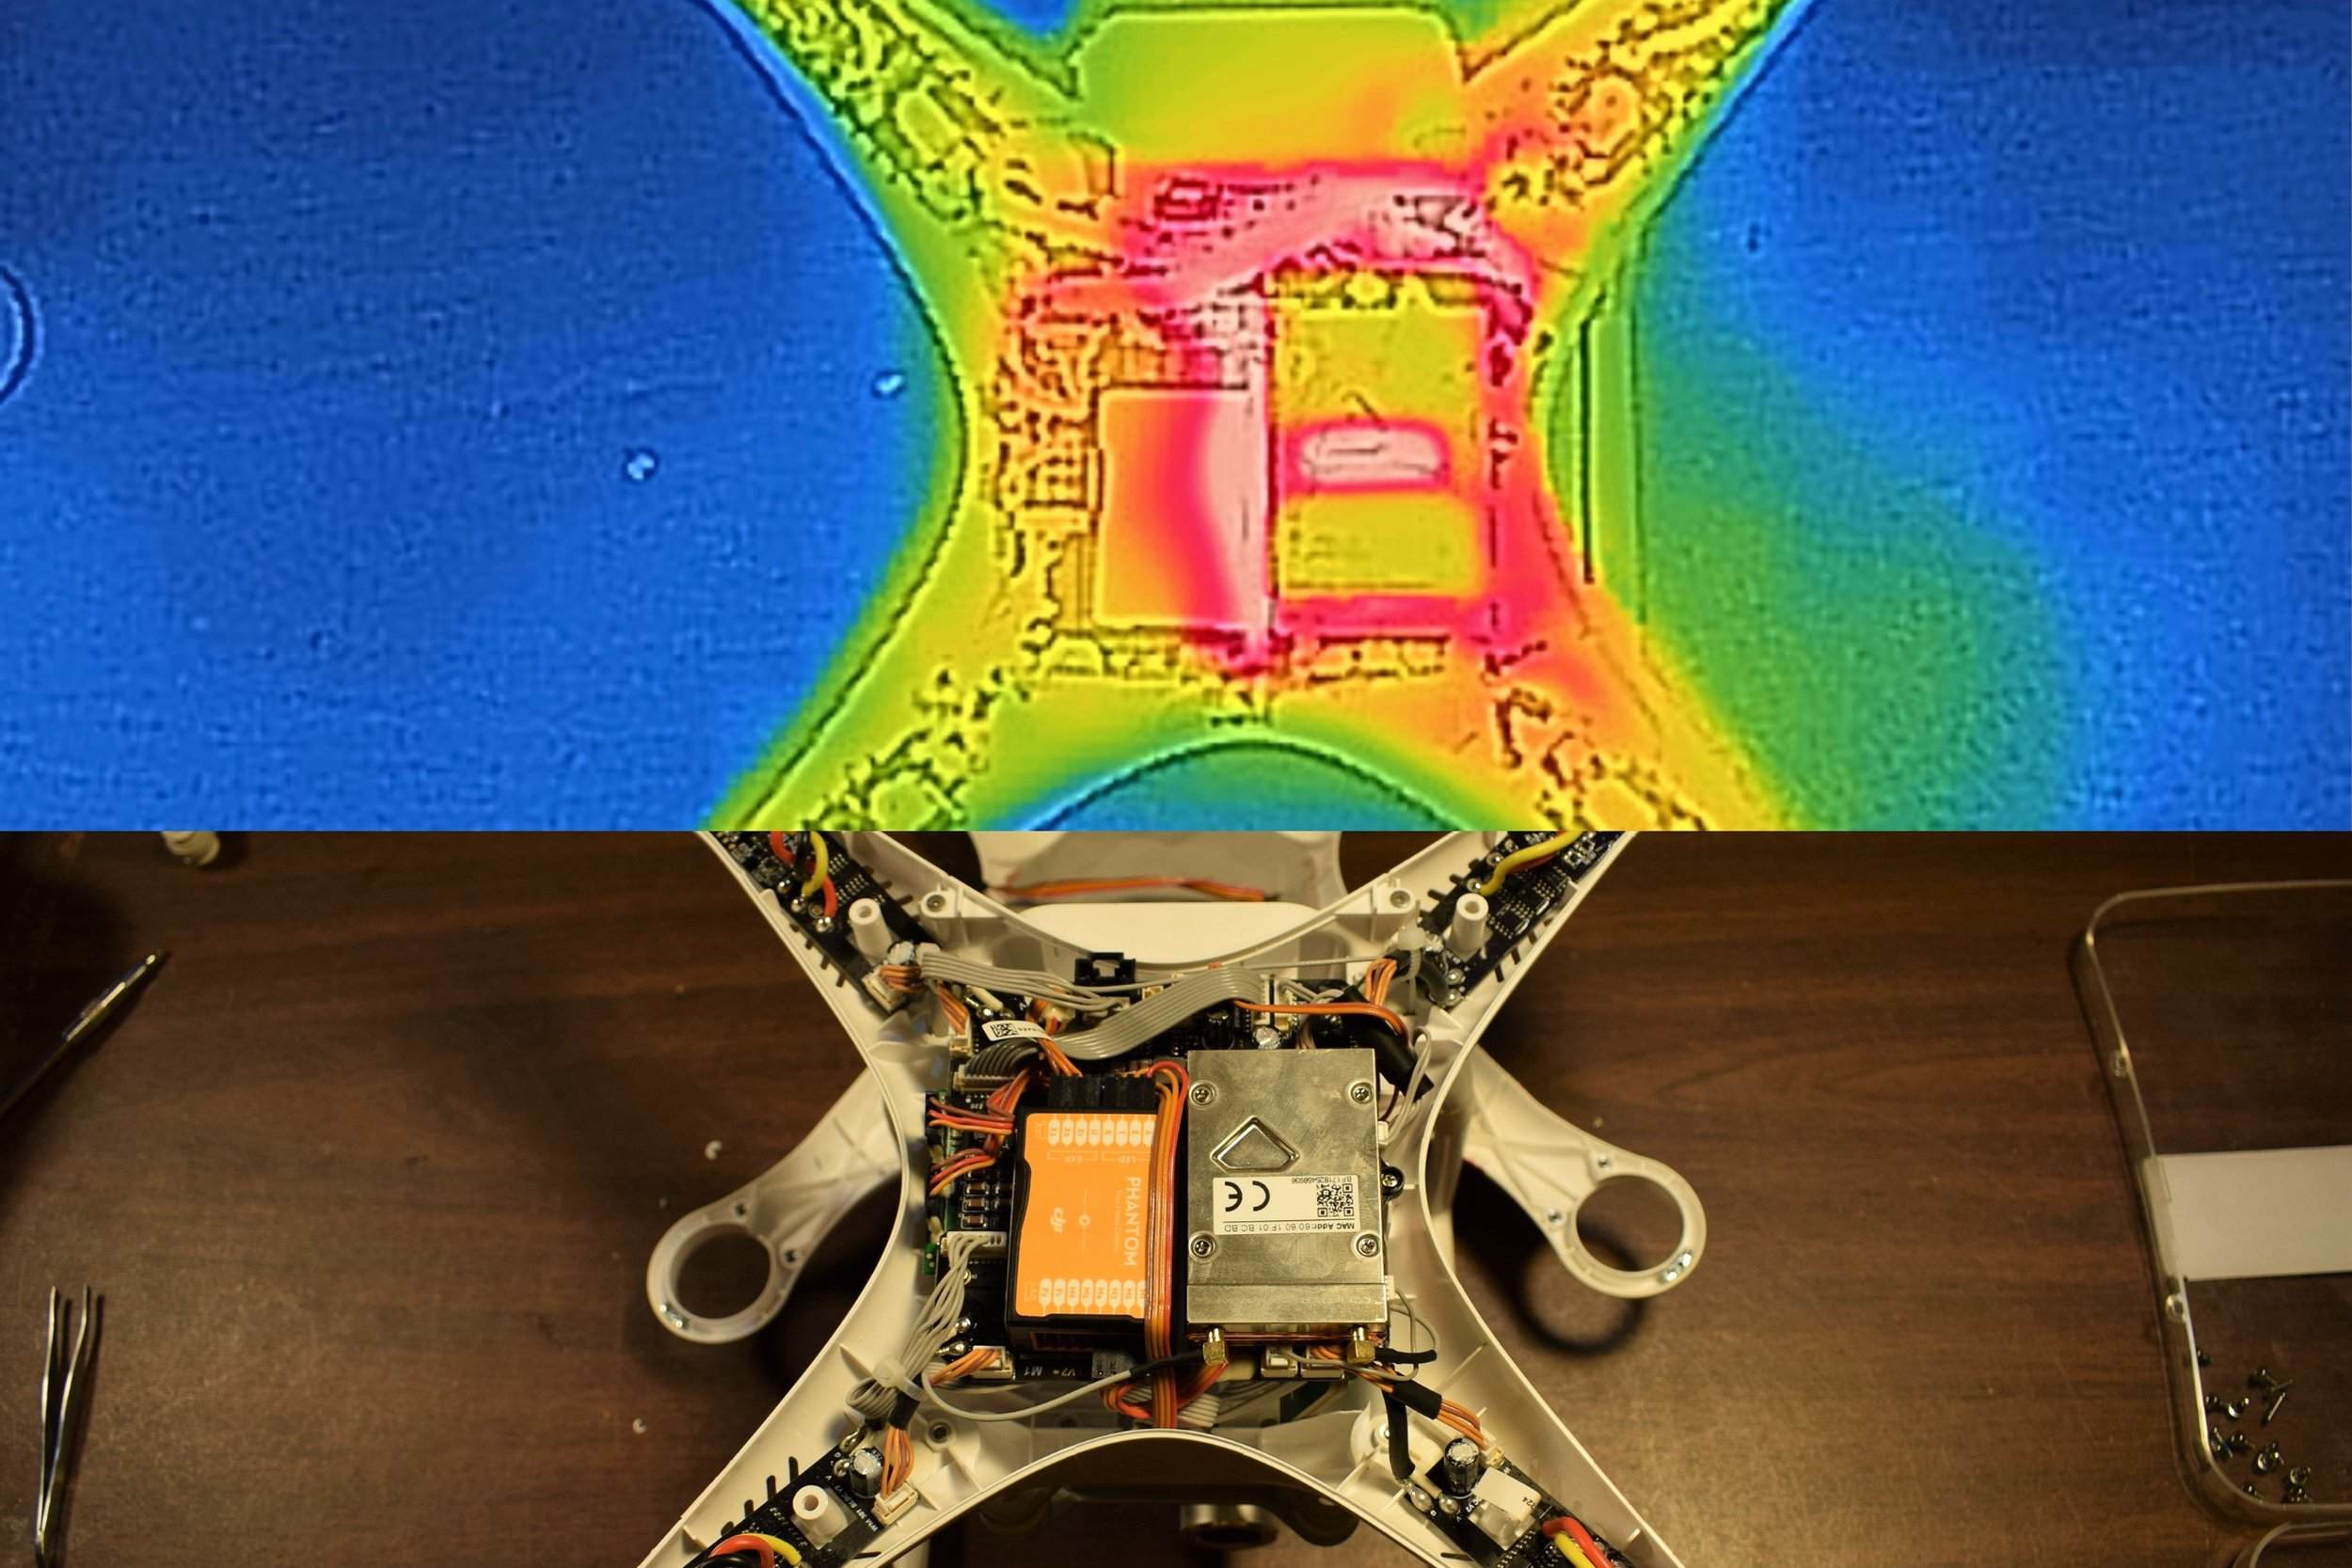 DJI Drone Repair.jpg